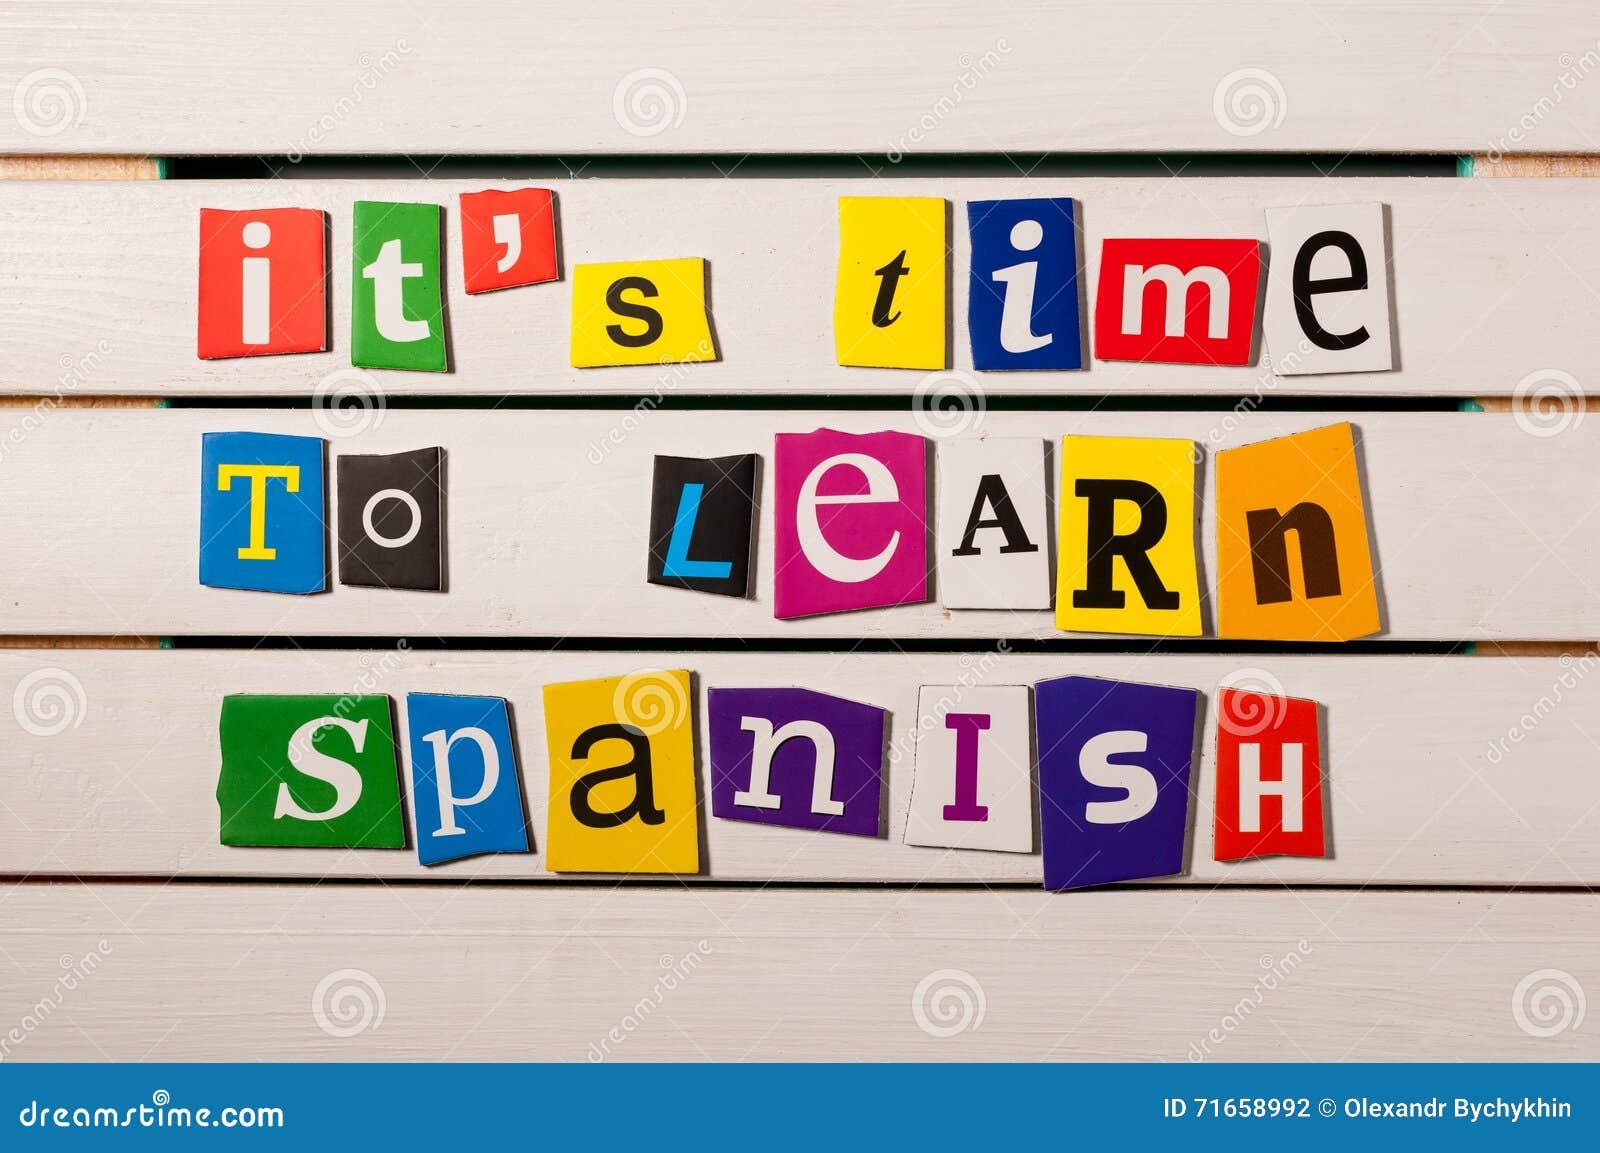 Learn Spanish with SpanishPod101.com - YouTube